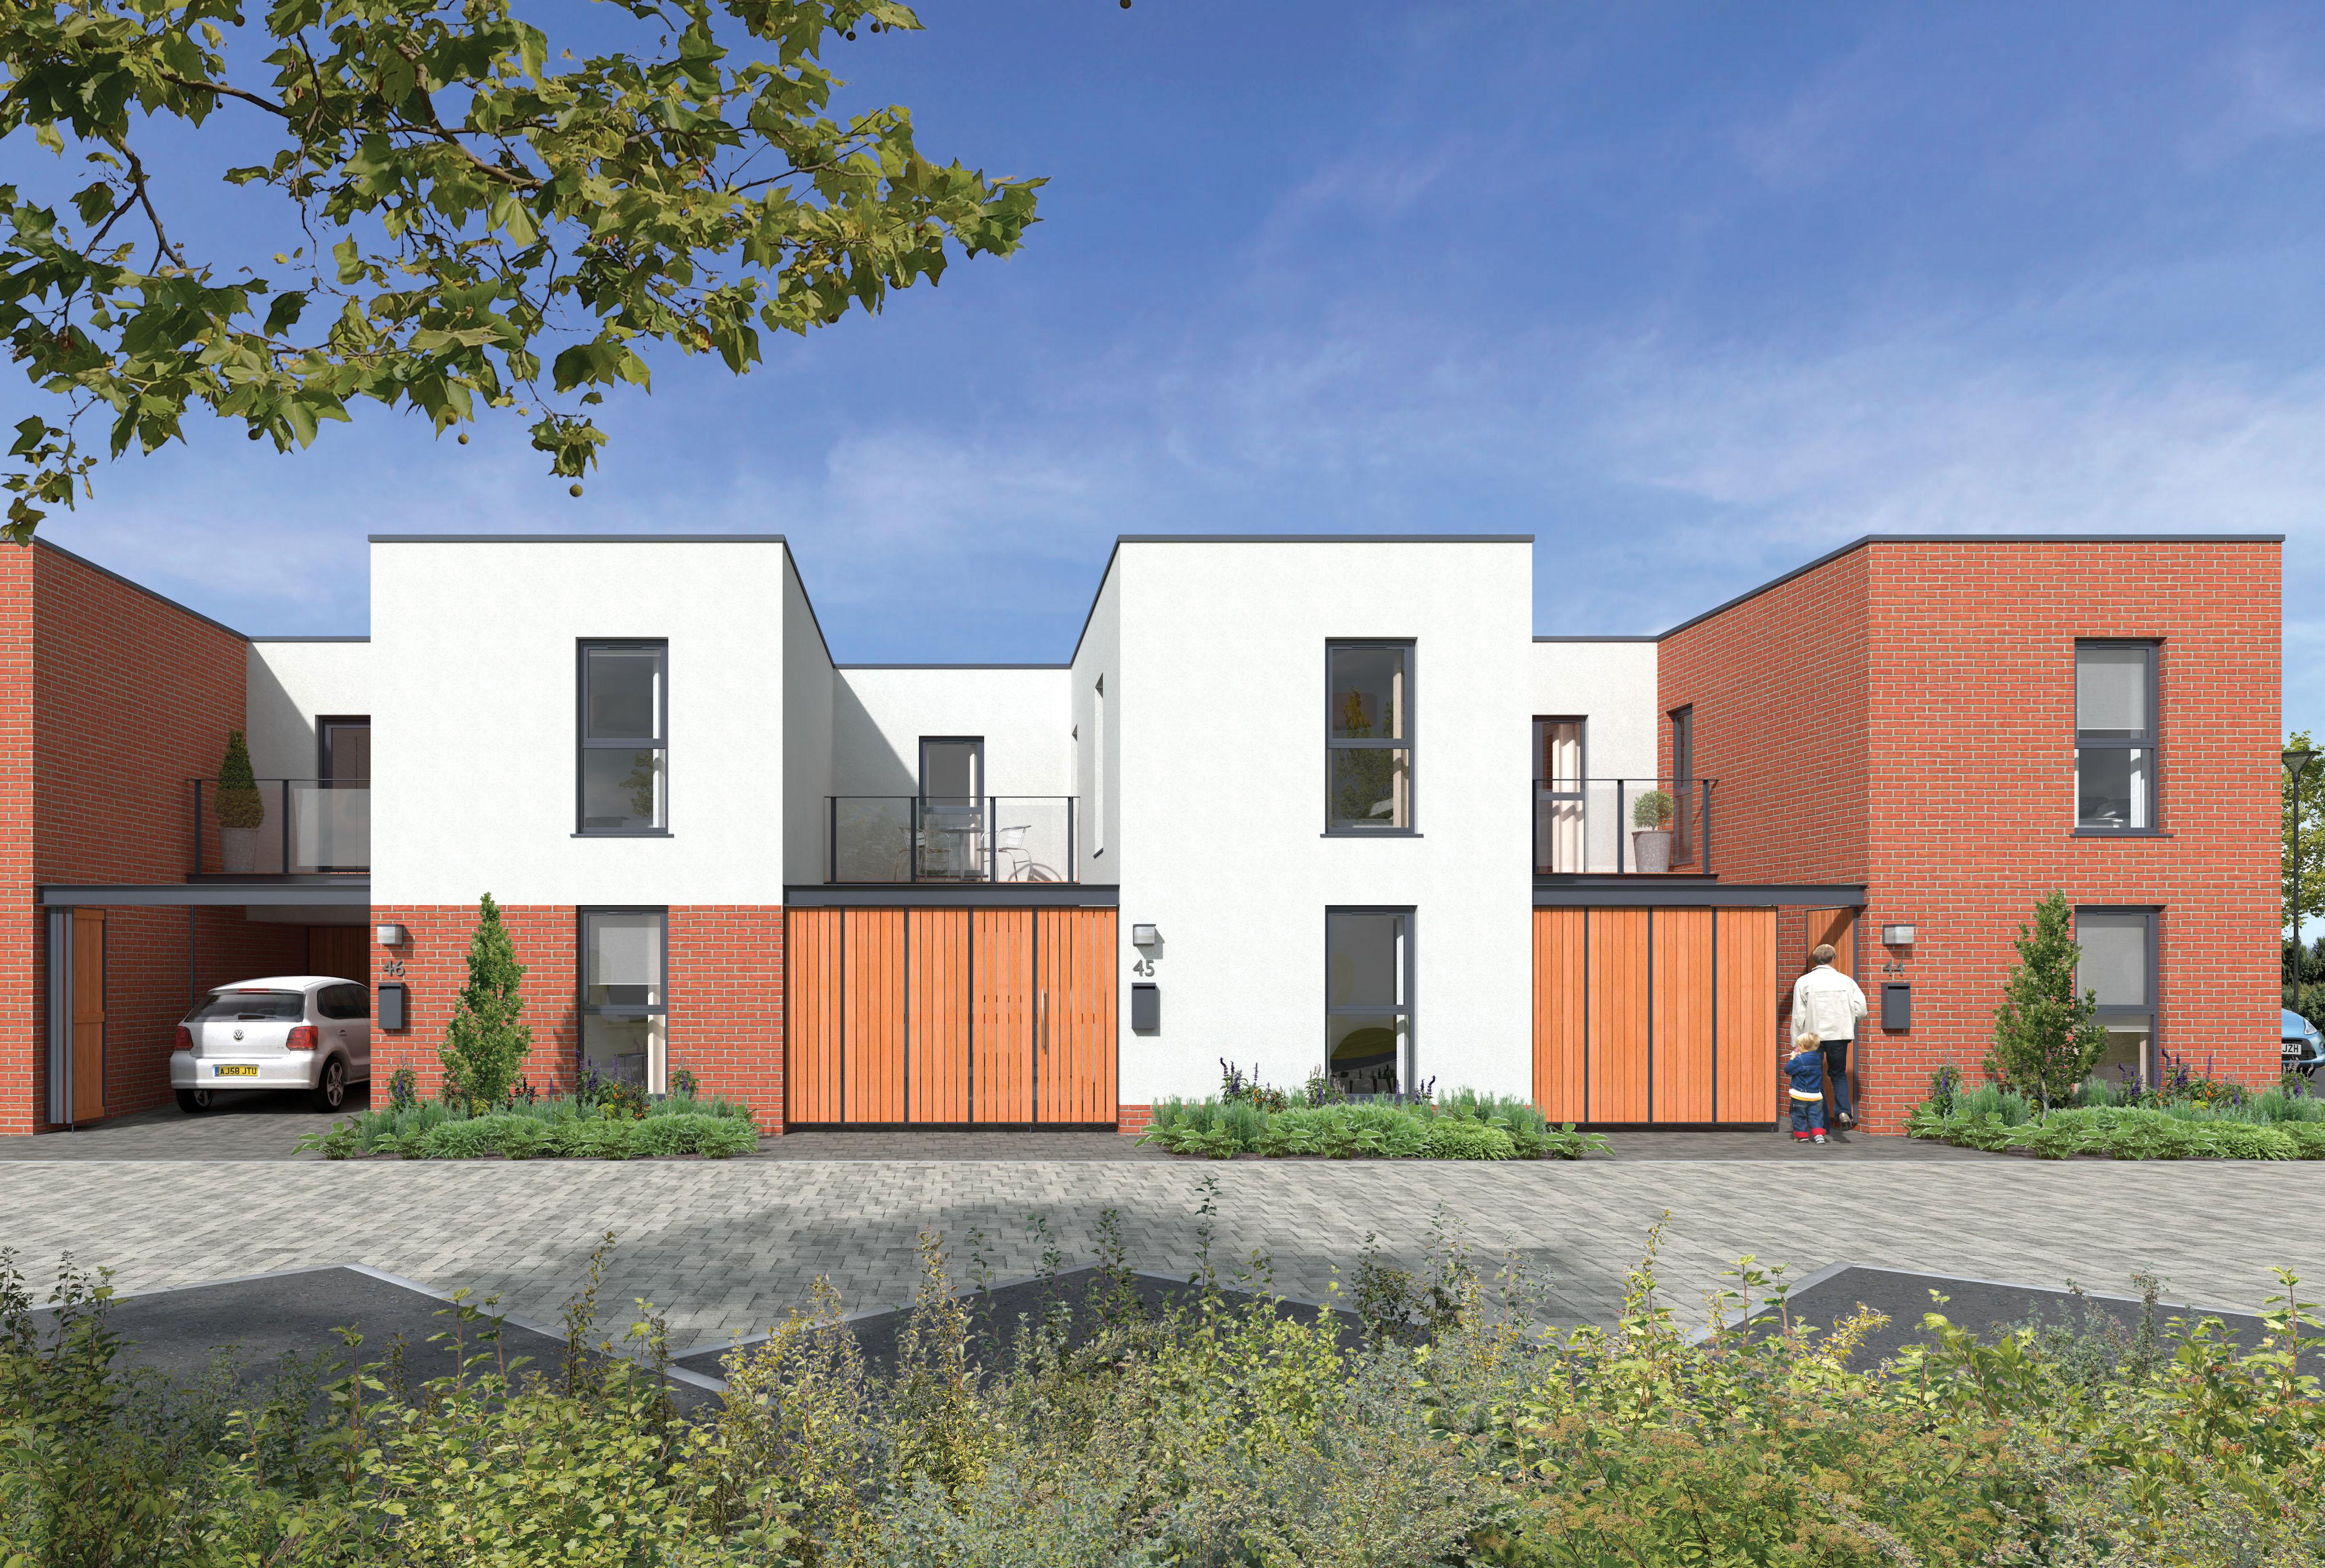 03d Bata Mews East Tilbury Rm18 8rh Hexa Homes